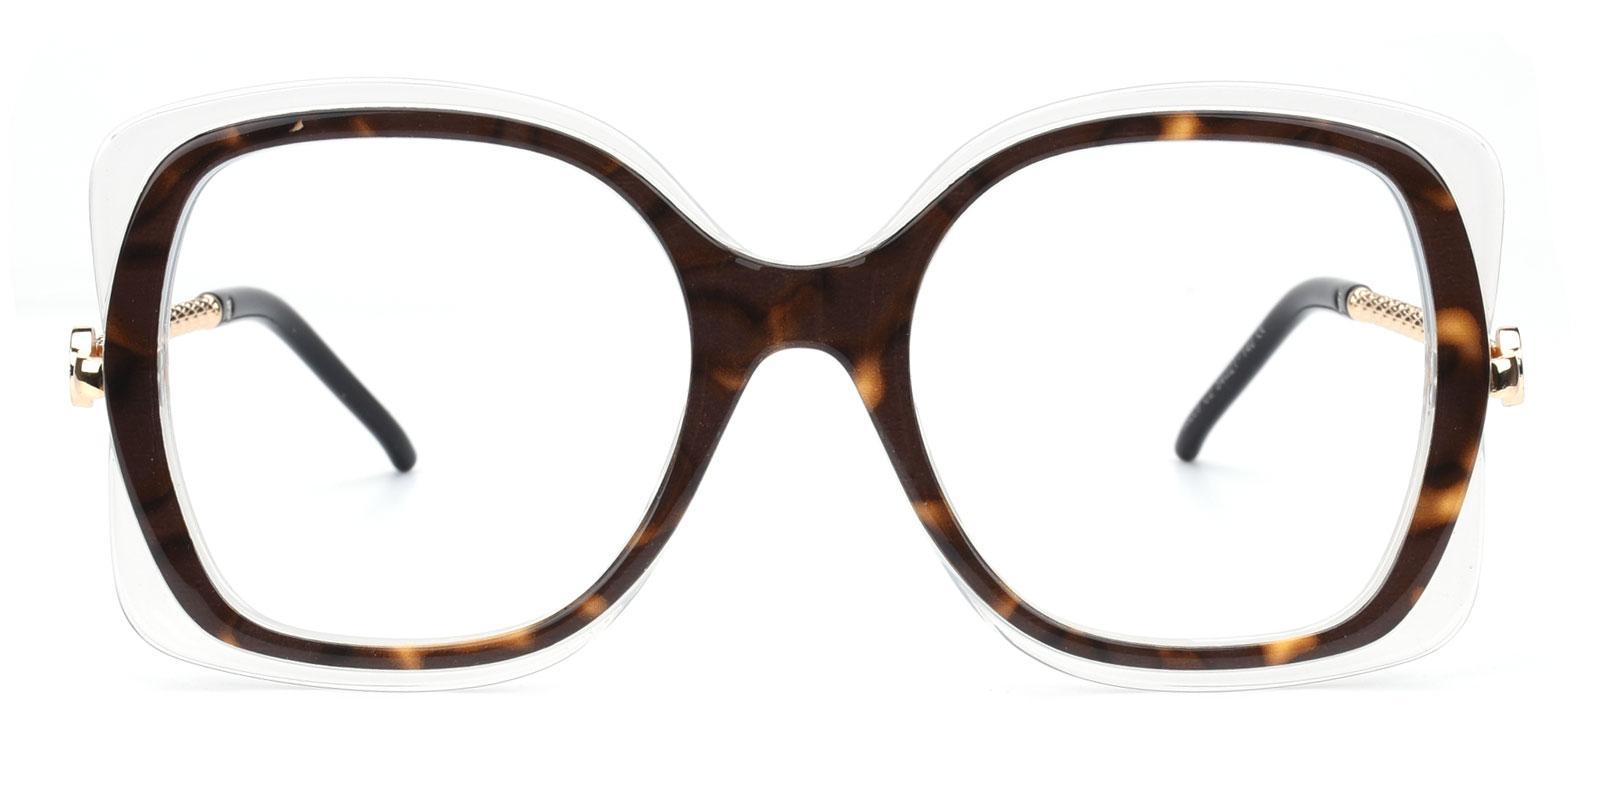 Belinda-Tortoise-Square-Plastic-Eyeglasses-additional2